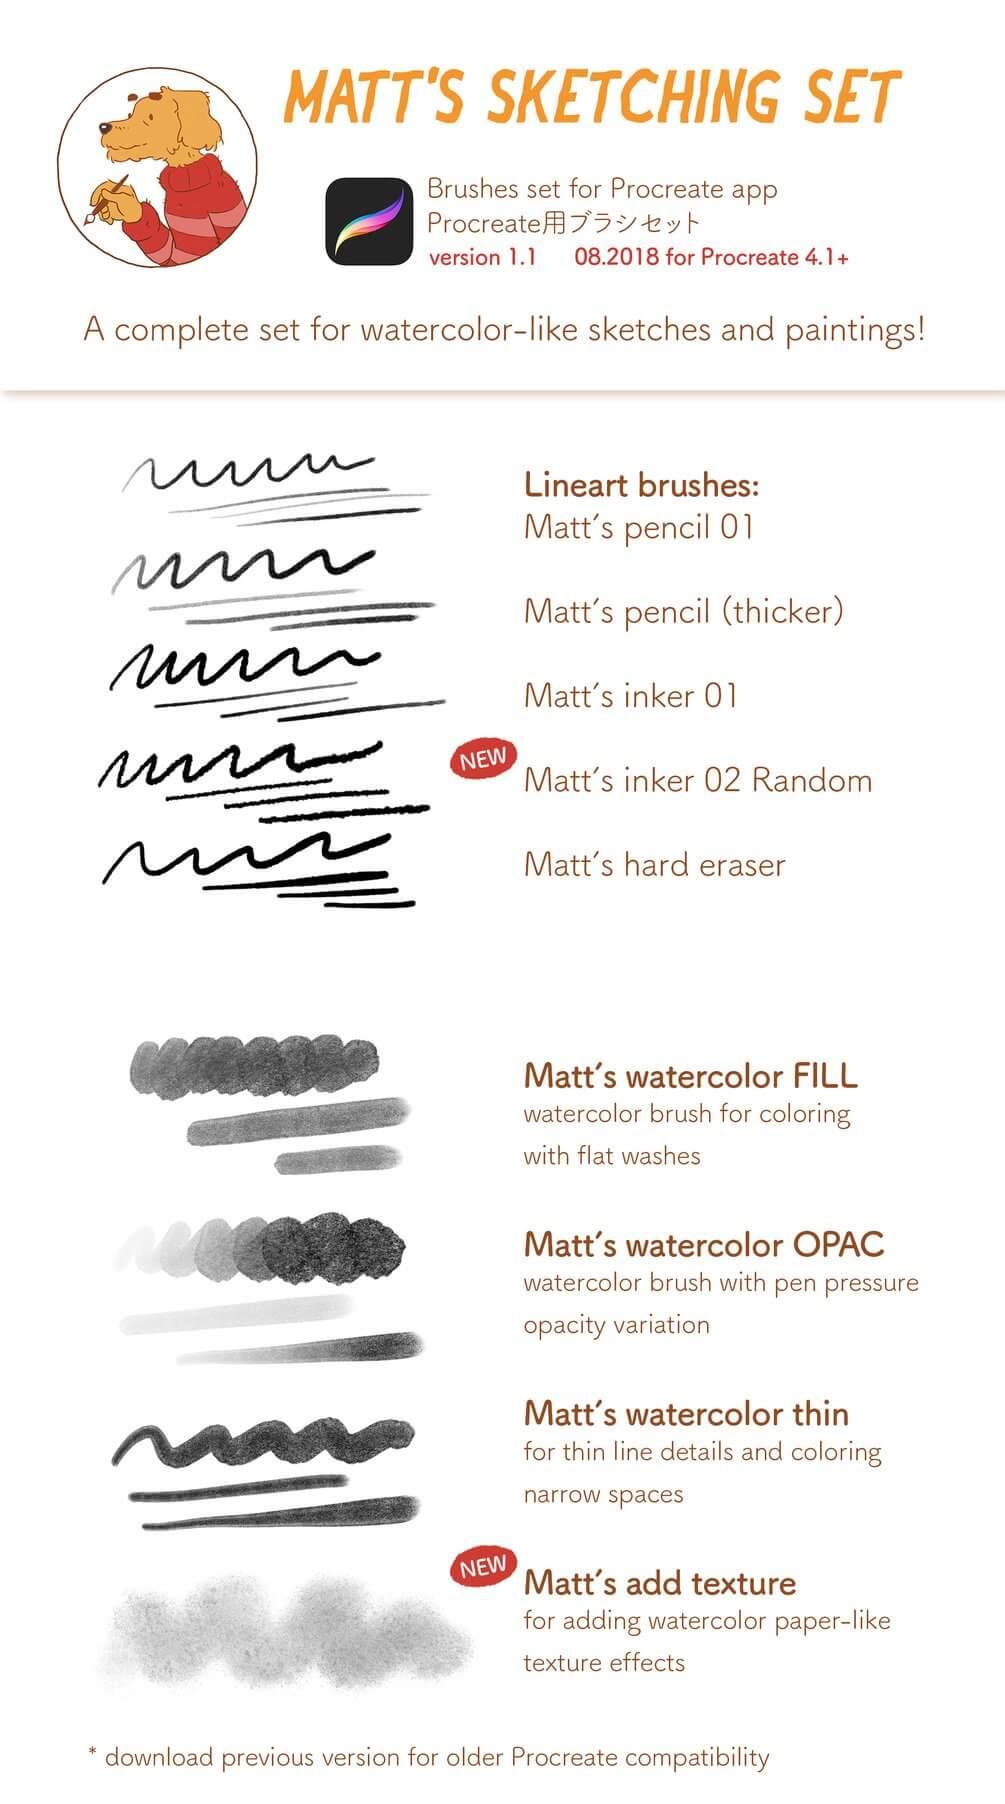 Matt's Sketching Procreate brush set version 1.1